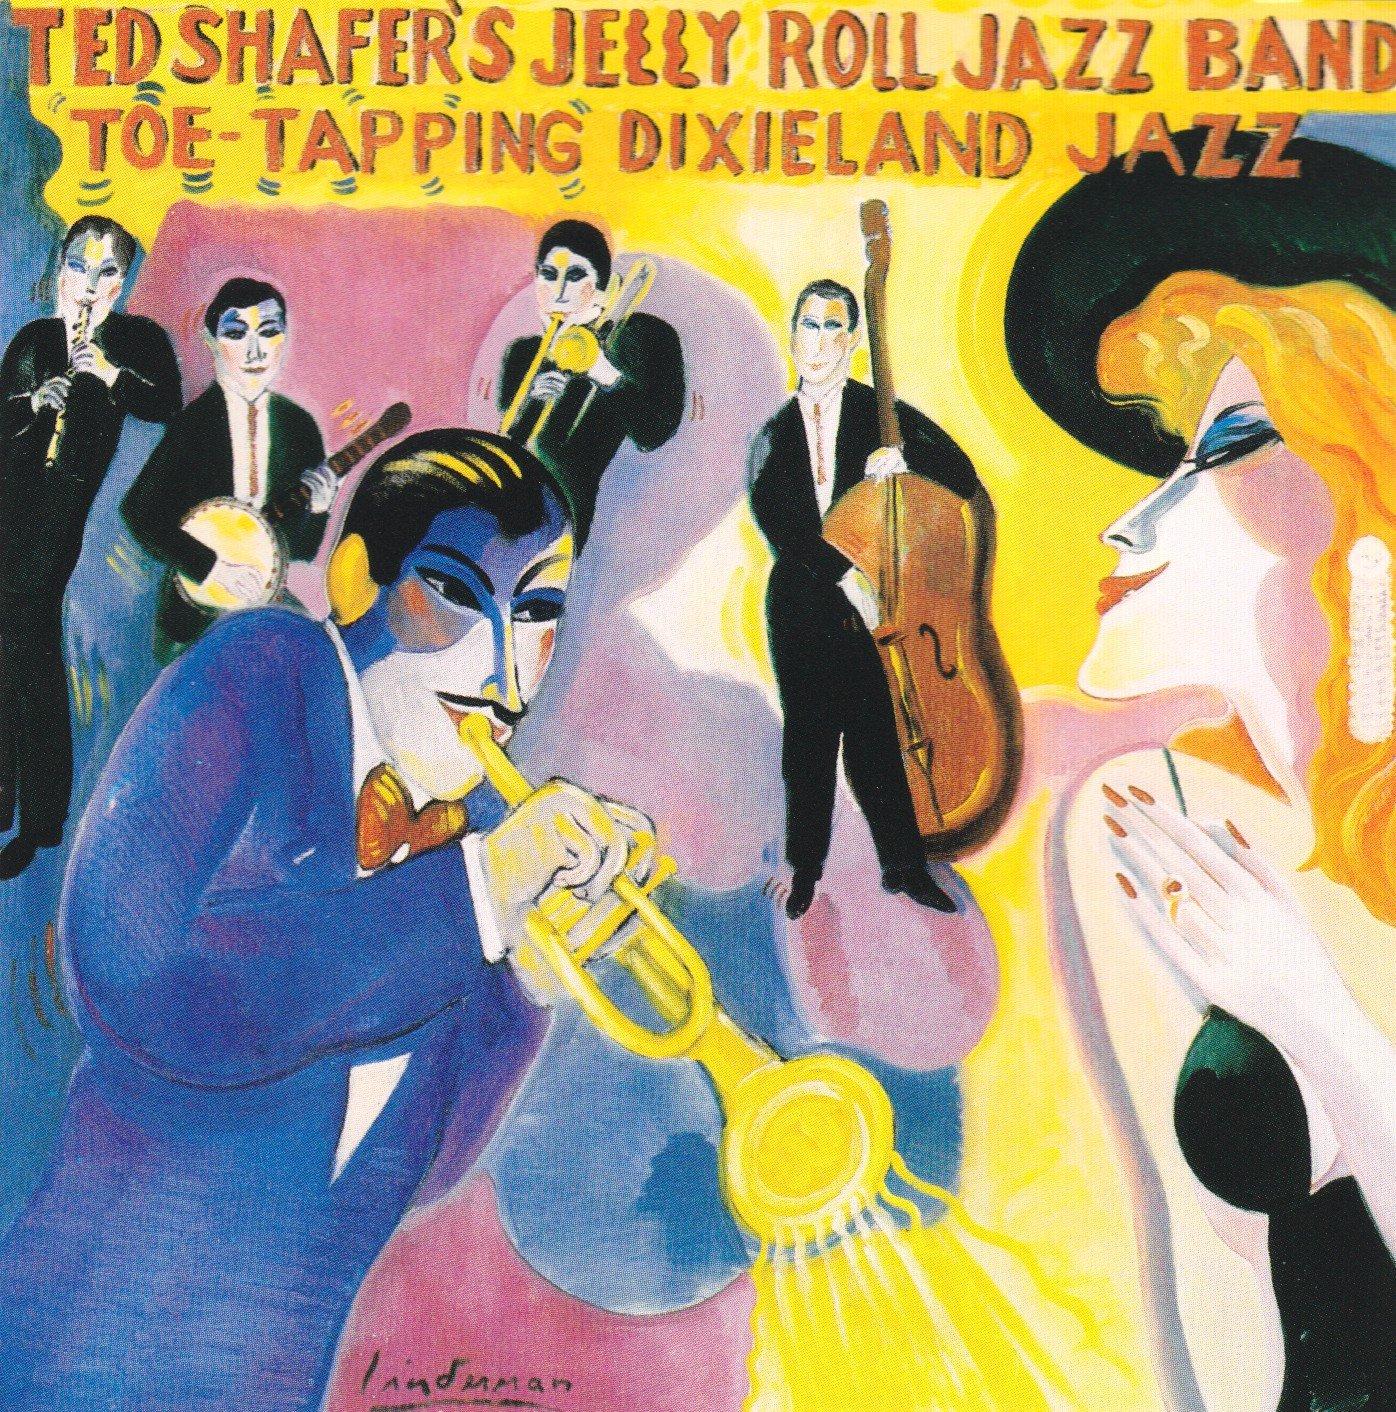 Columbus Mall Toe Tapping Dixieland Max 70% OFF 2 Jazz Vol